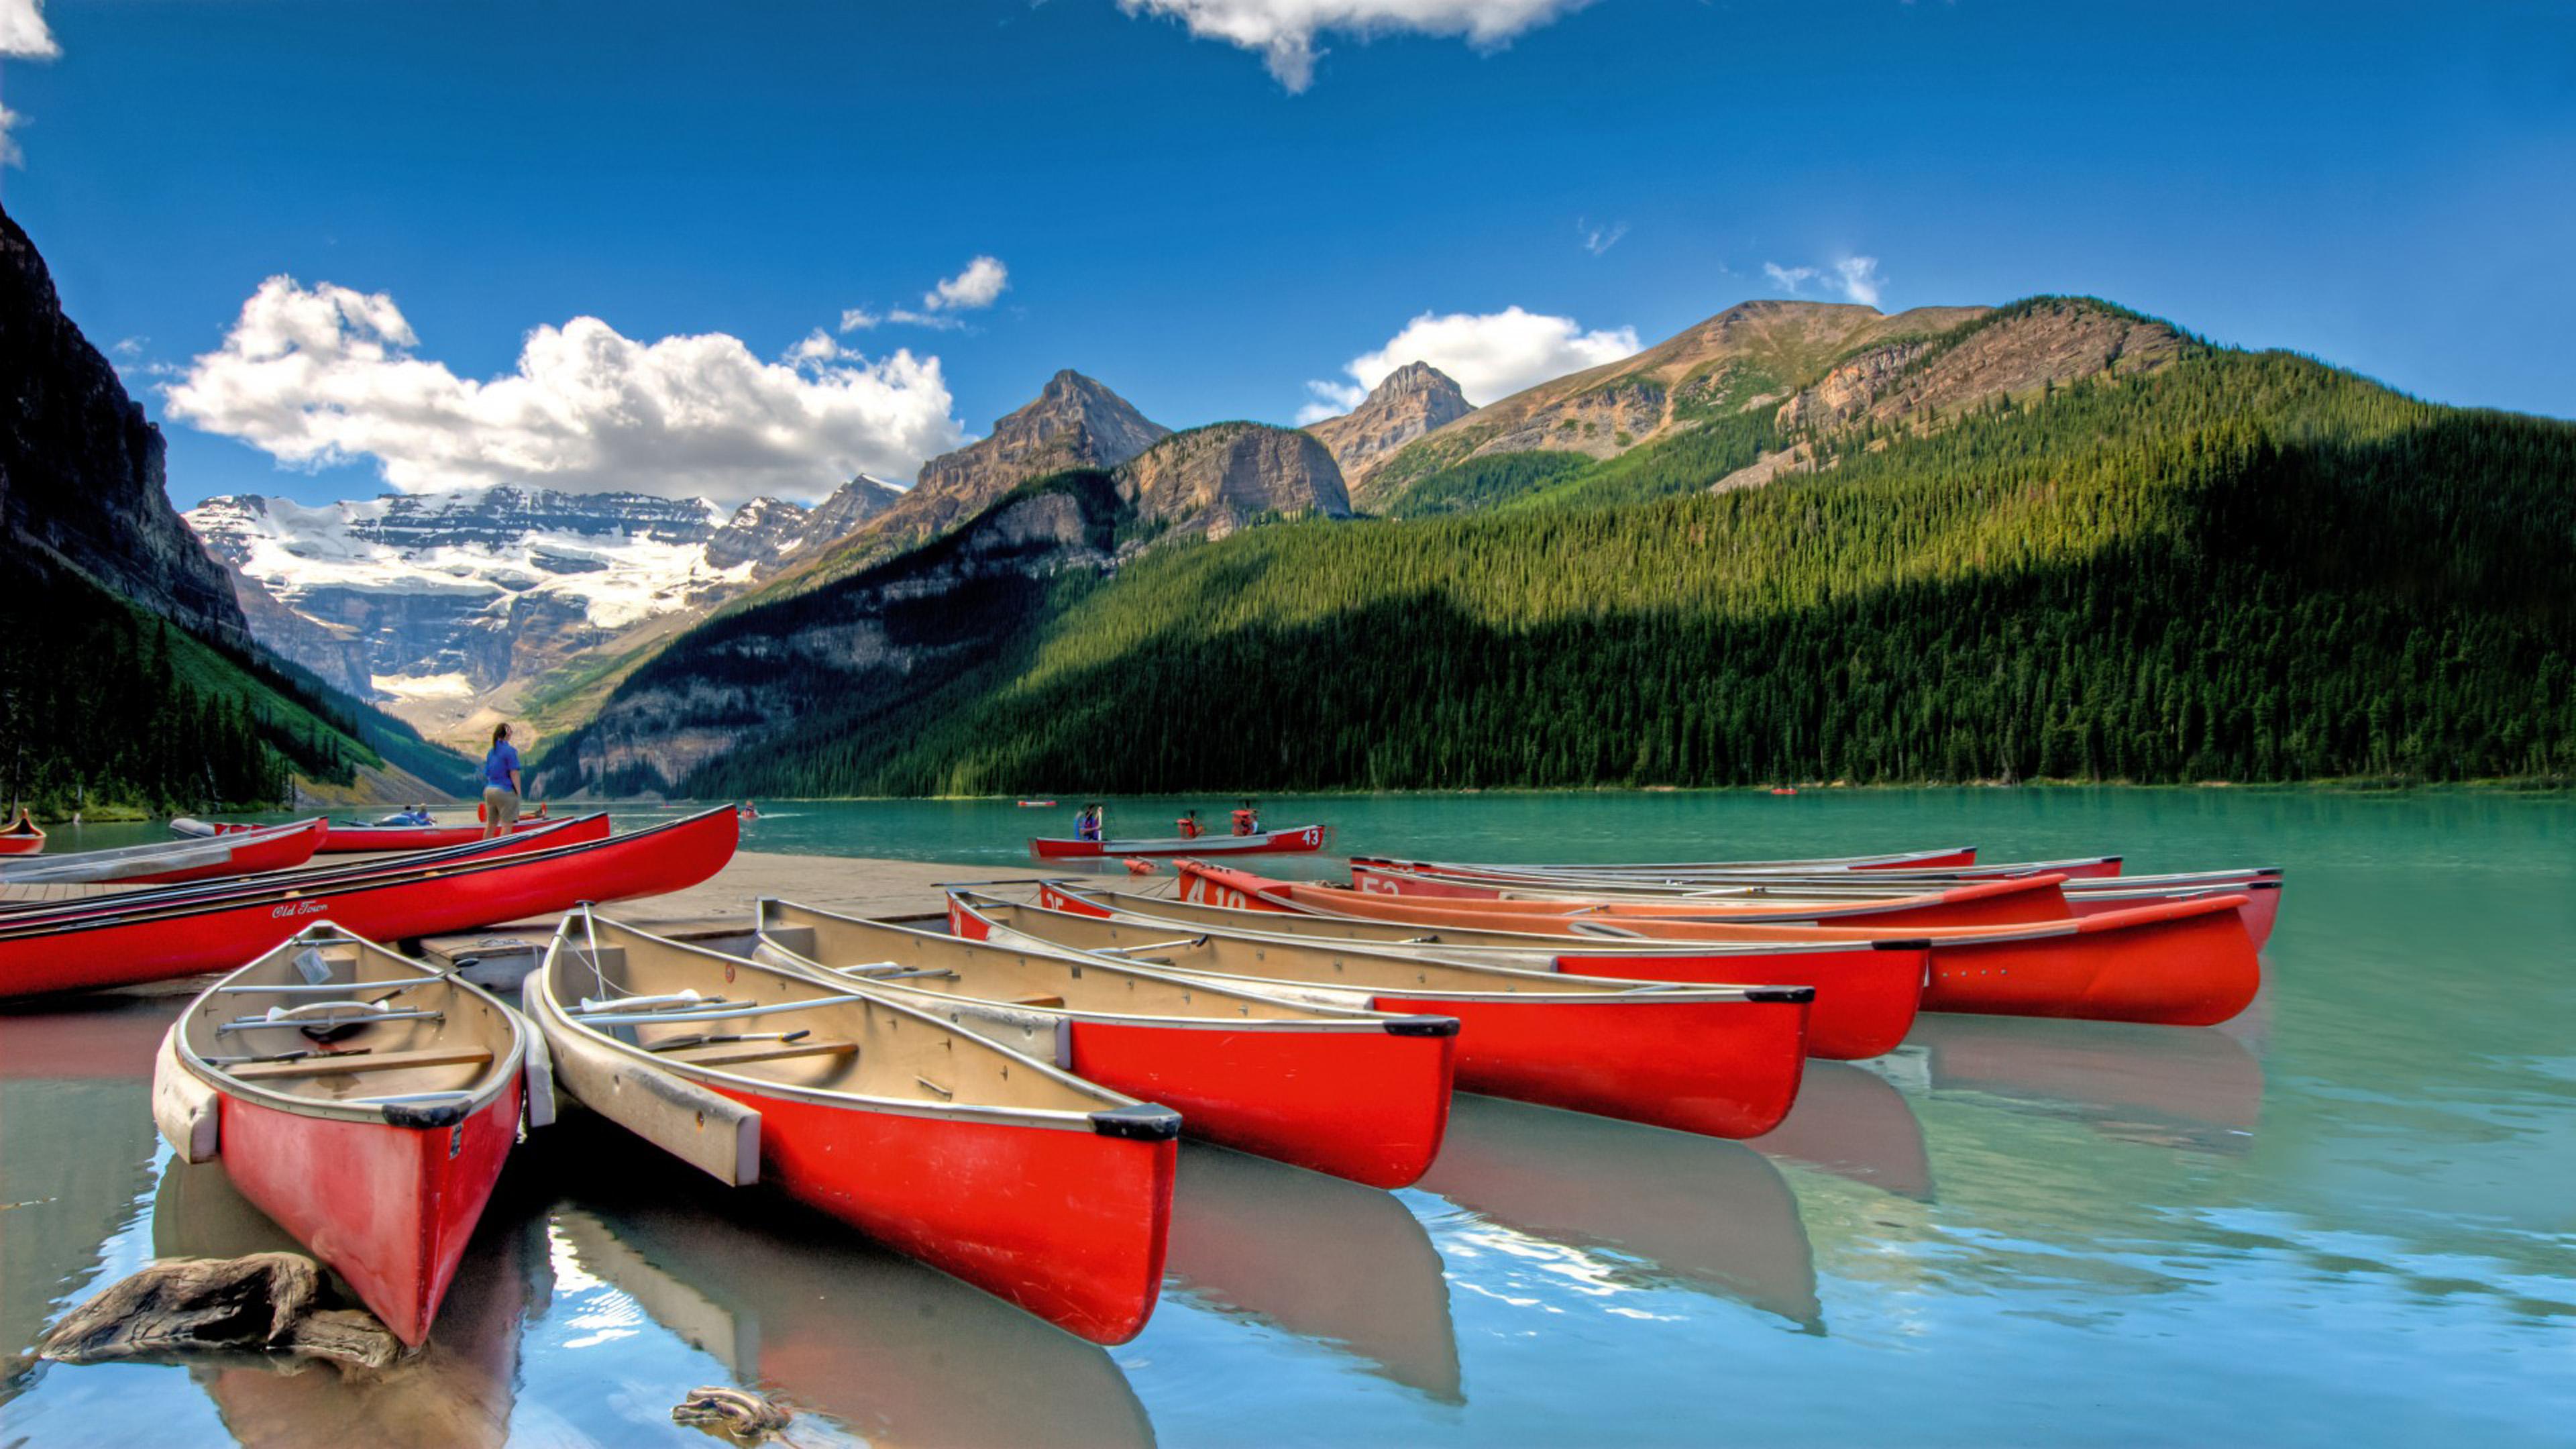 Lake Louise Is A Hamlet In Alberta Canada Banff National Park Marina Mountains Canoeing Desktop